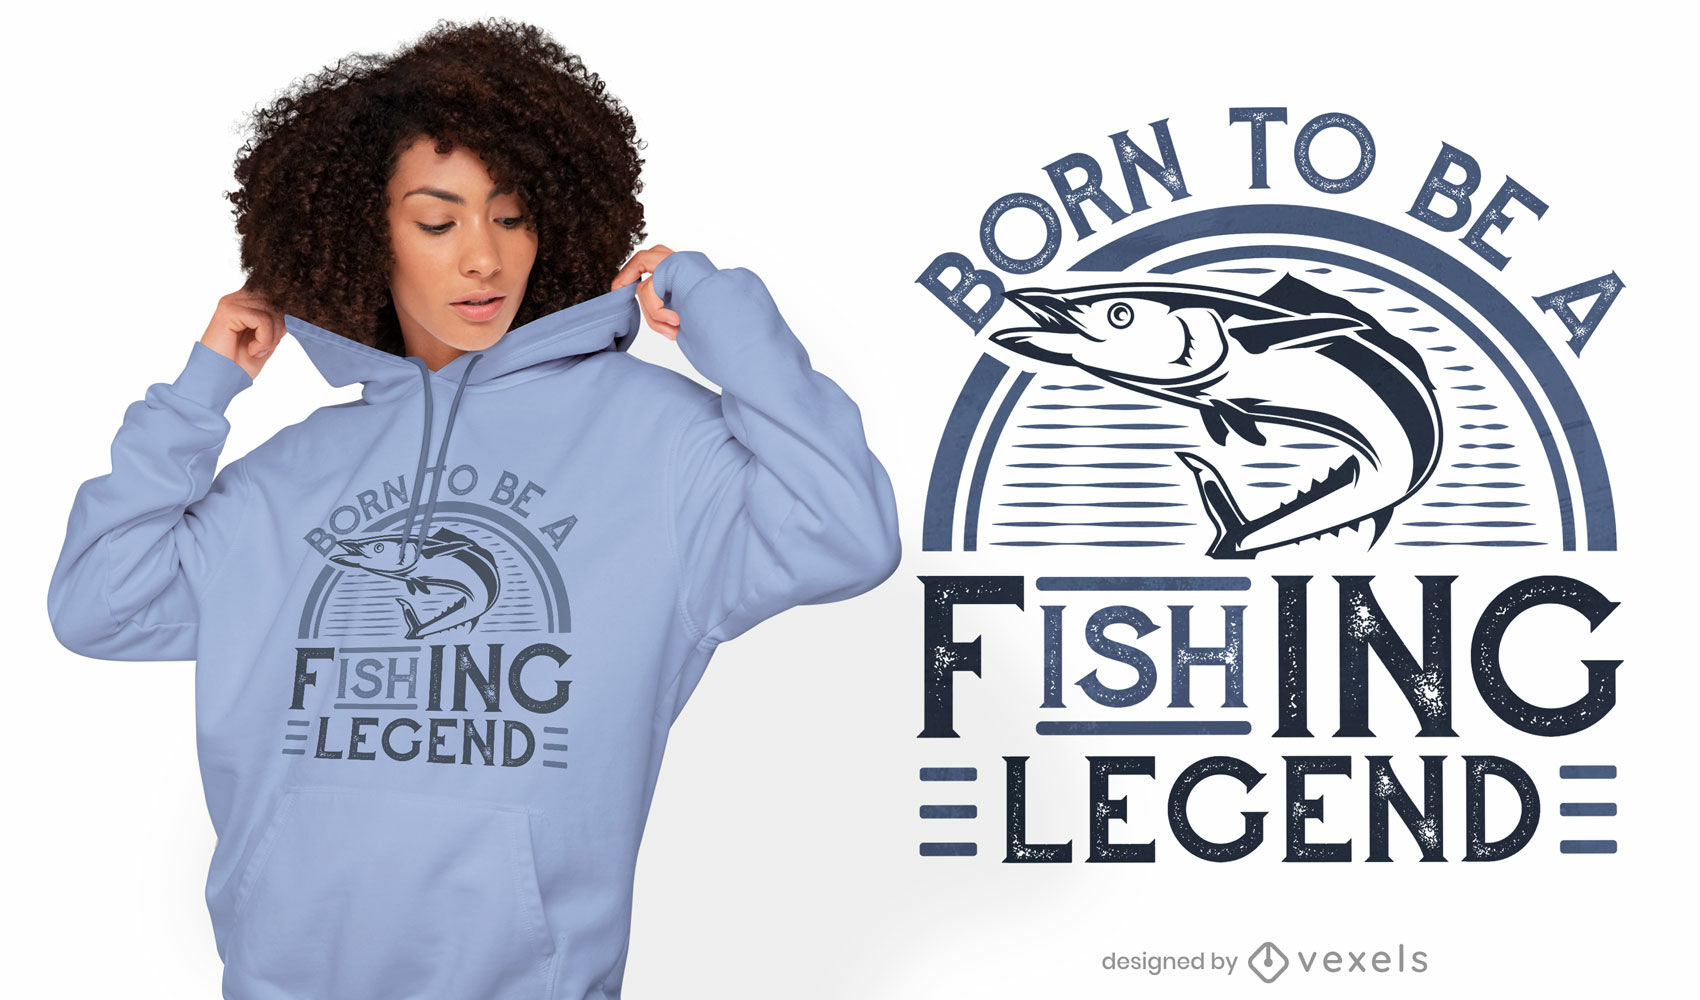 Dise?o de camiseta de leyenda de la pesca.